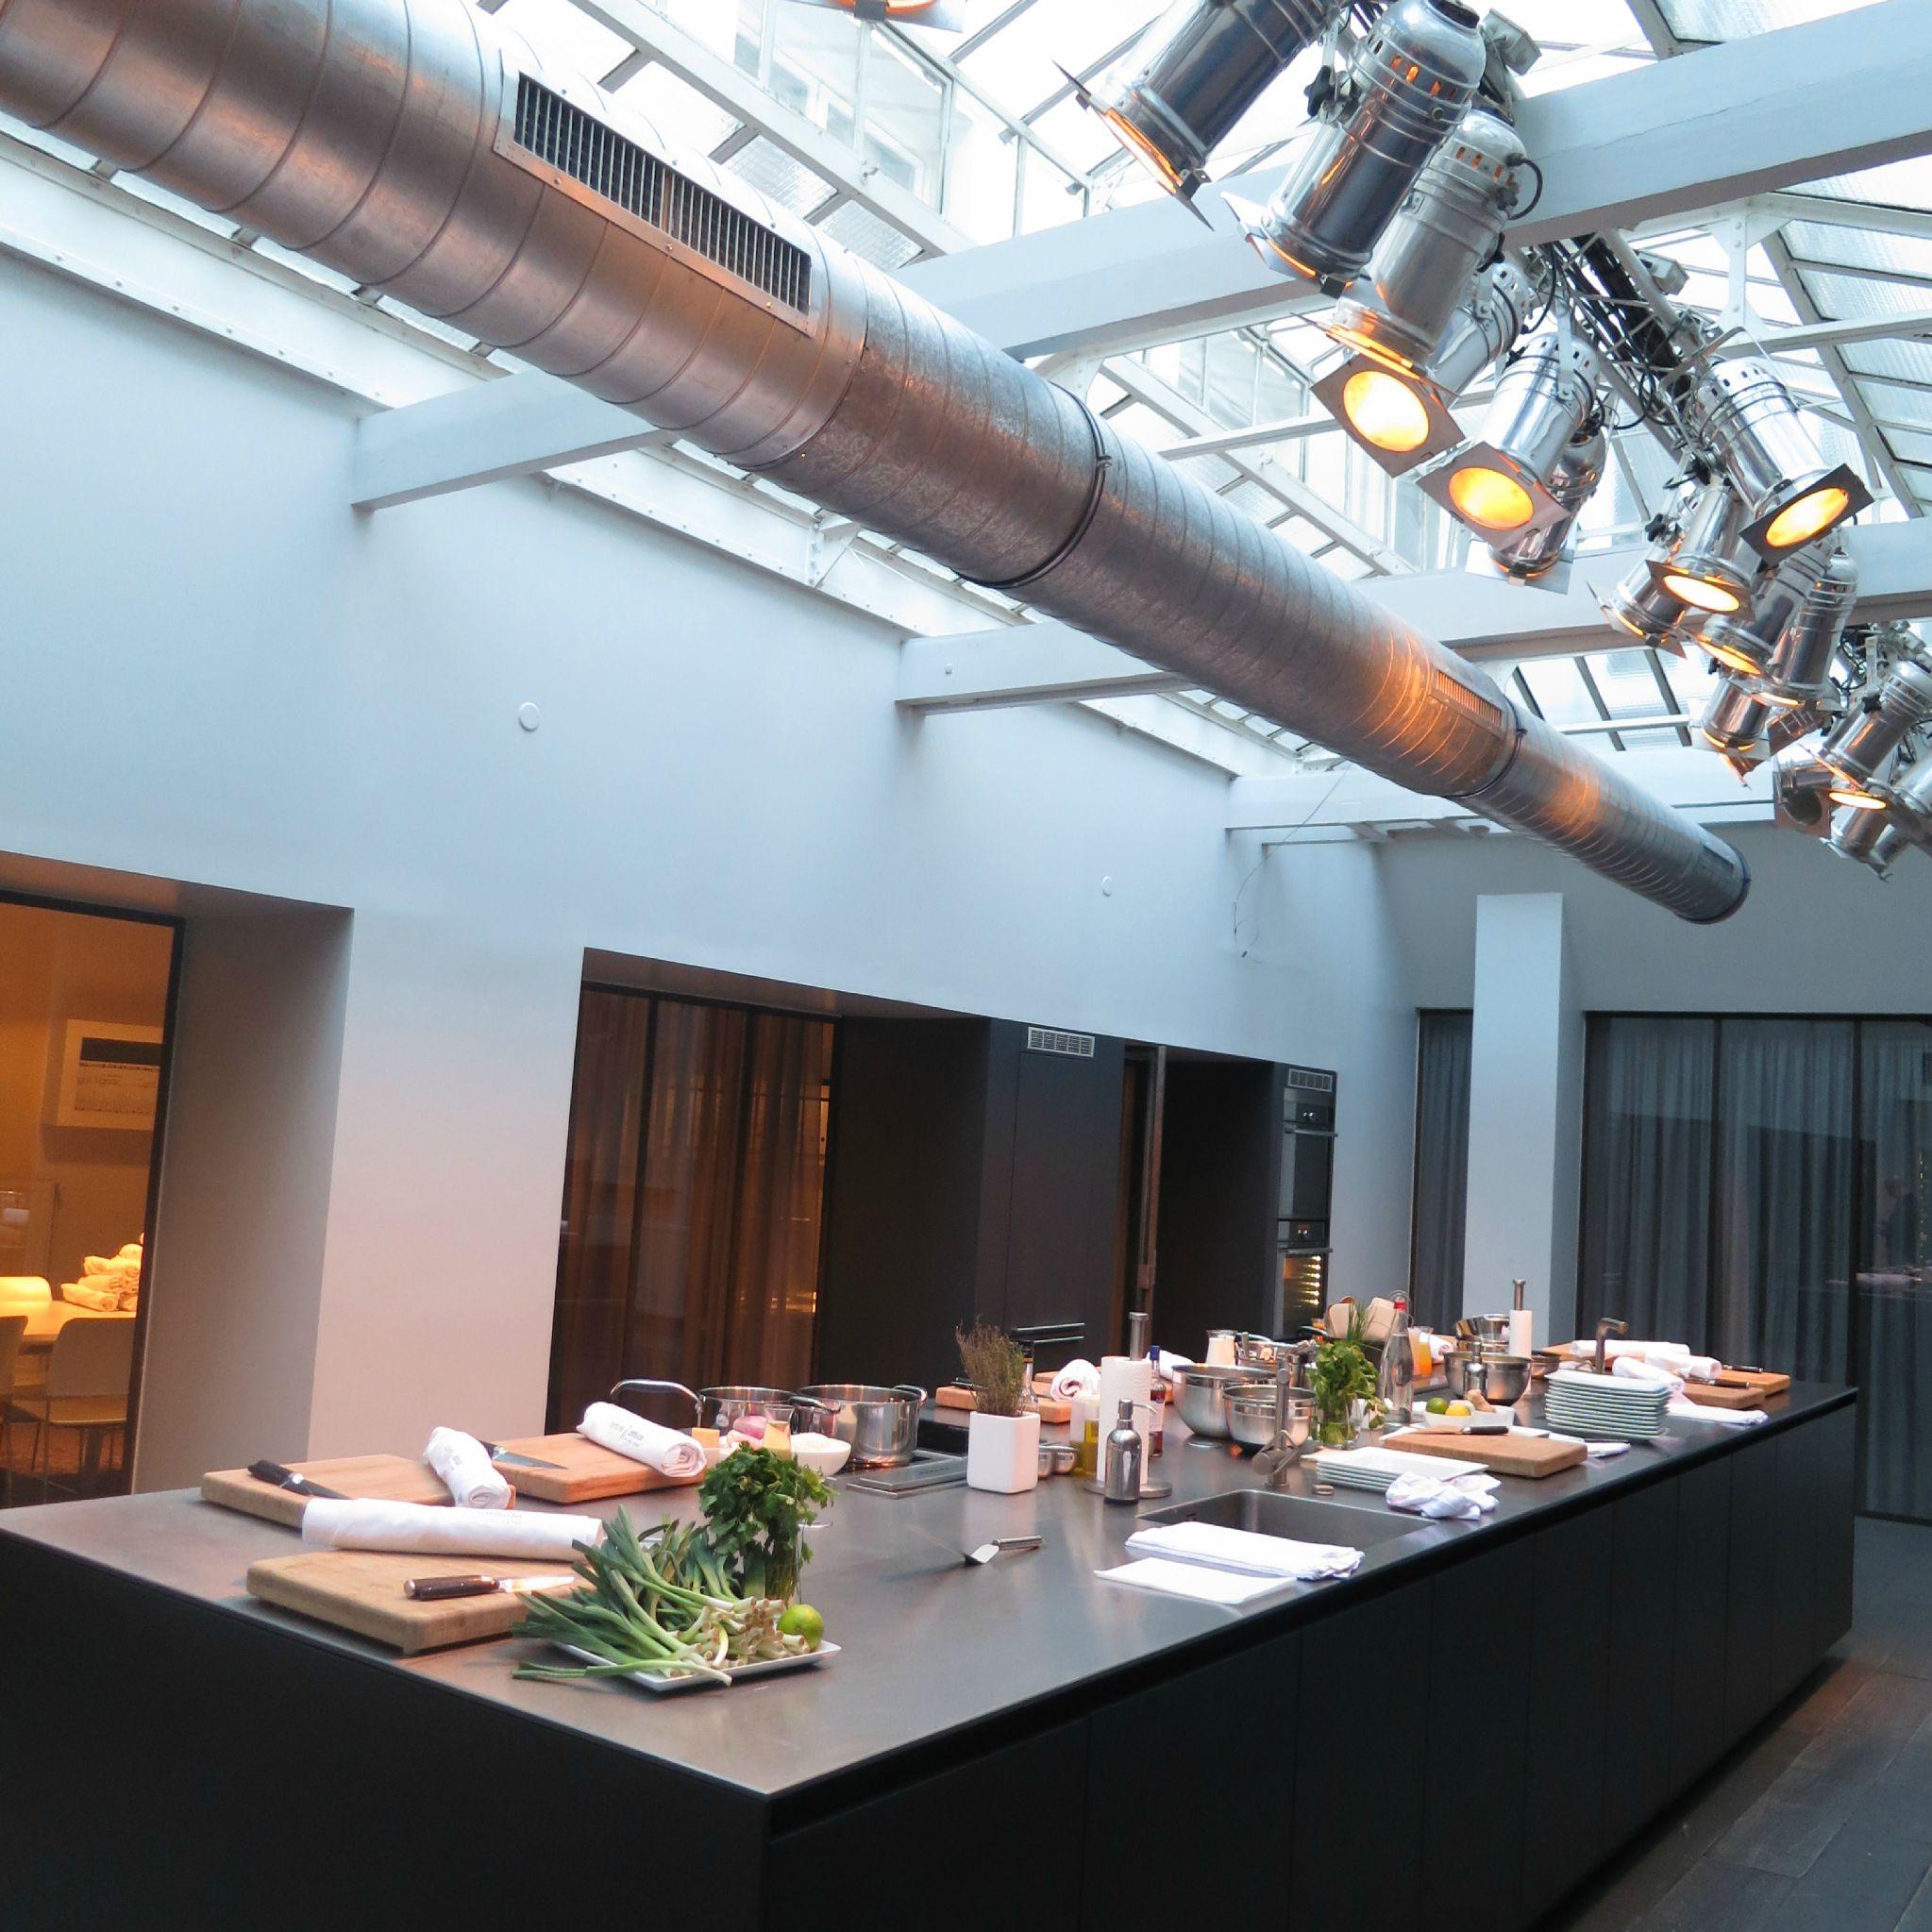 atelier cuisine attitude cyril lignac. Black Bedroom Furniture Sets. Home Design Ideas